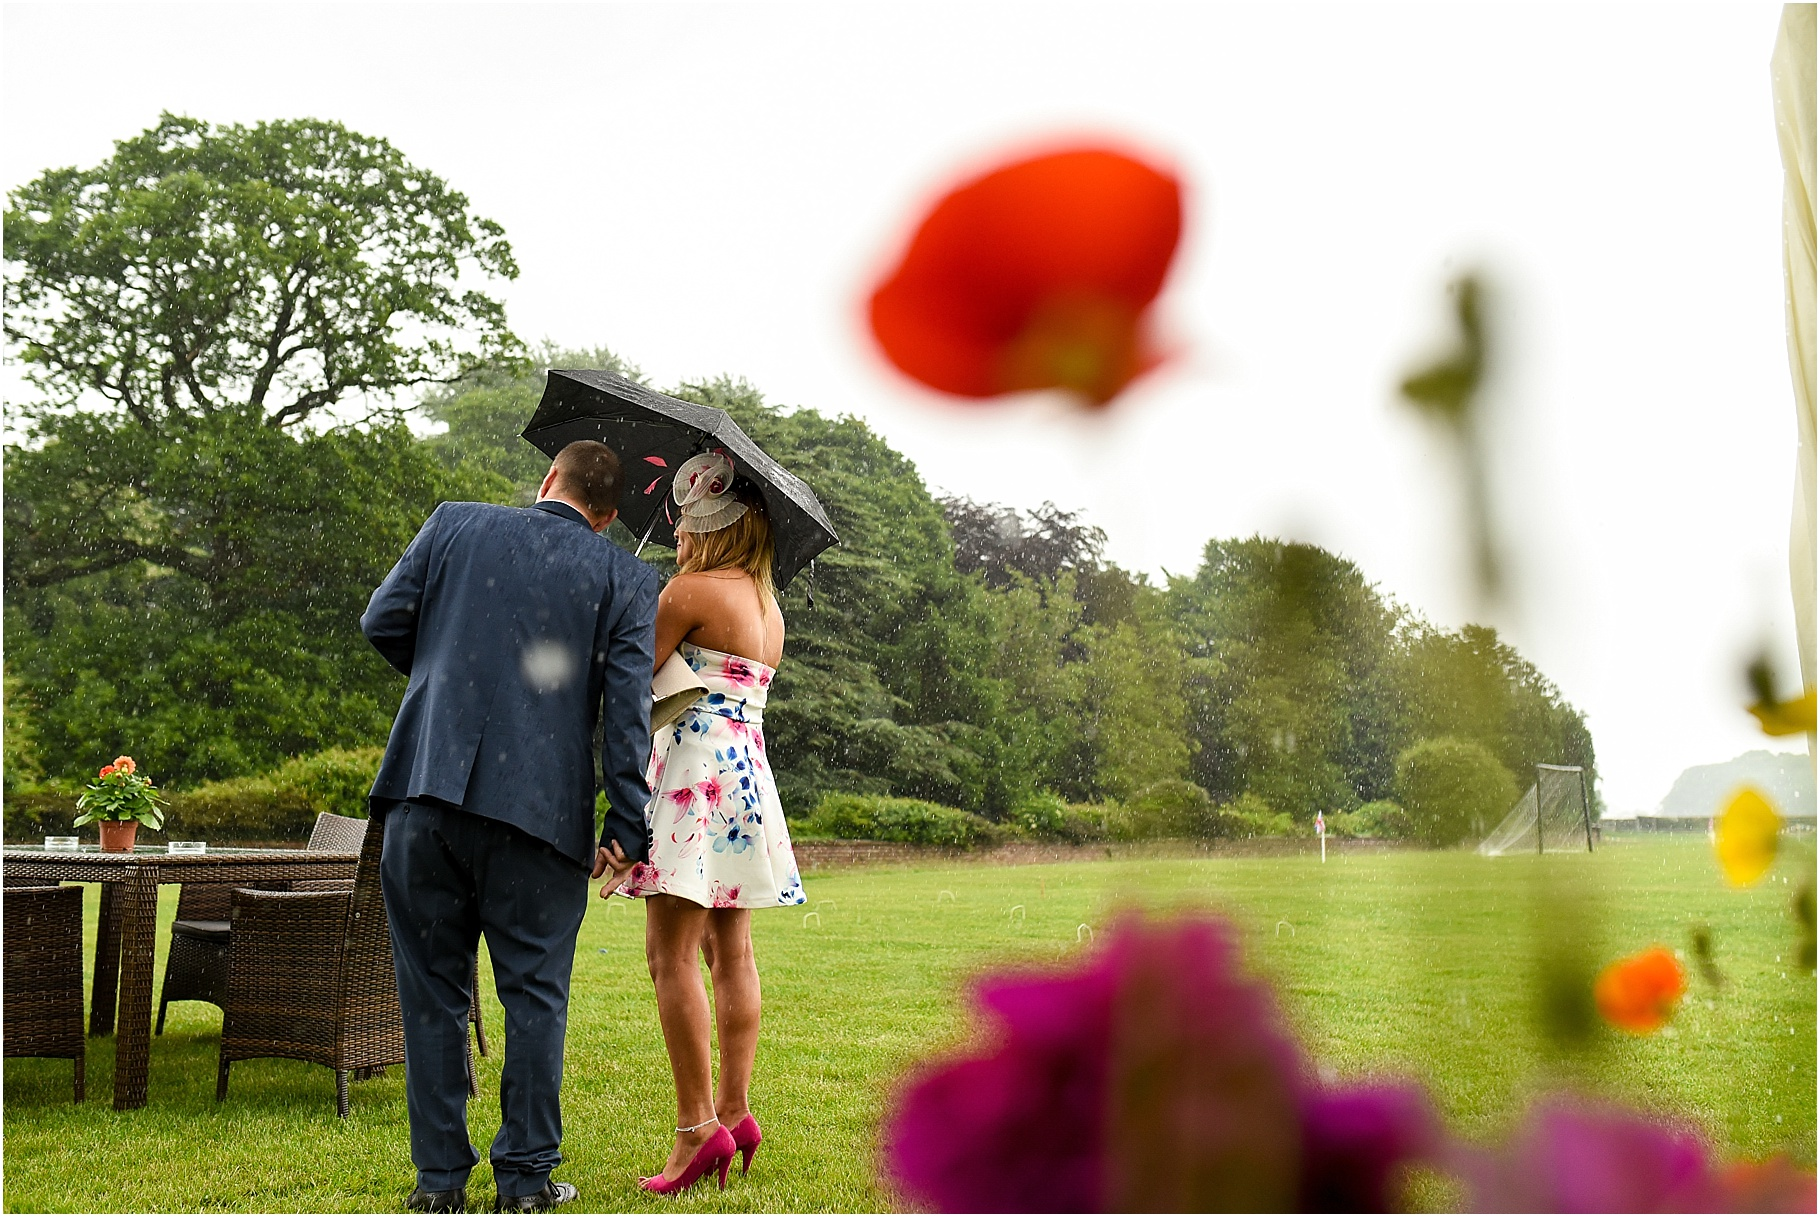 lancashire-marquee-wedding-053.jpg